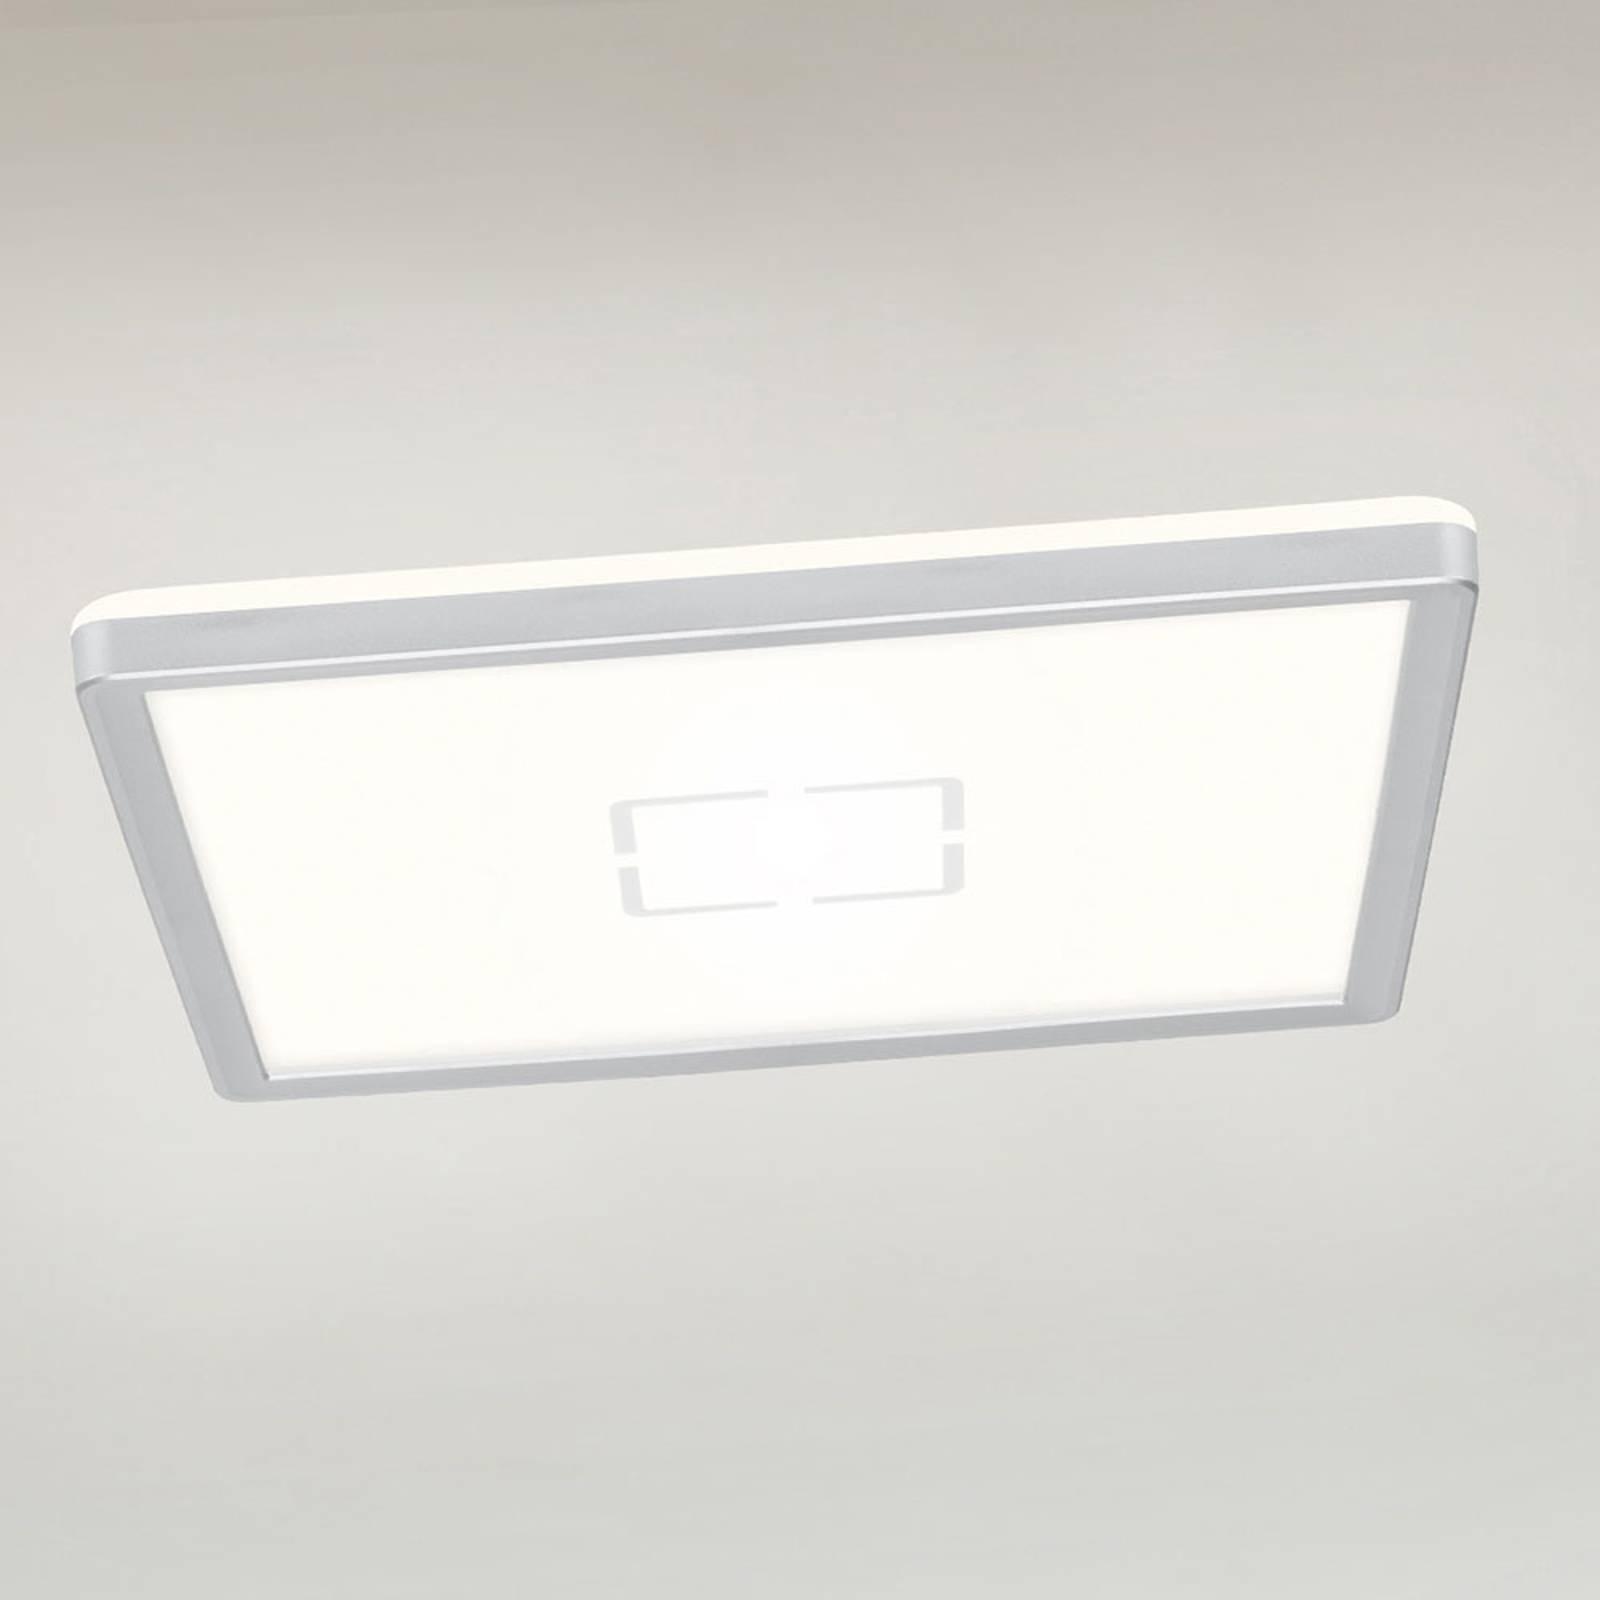 LED-kattovalaisin Free, 29 x 29 cm, hopea